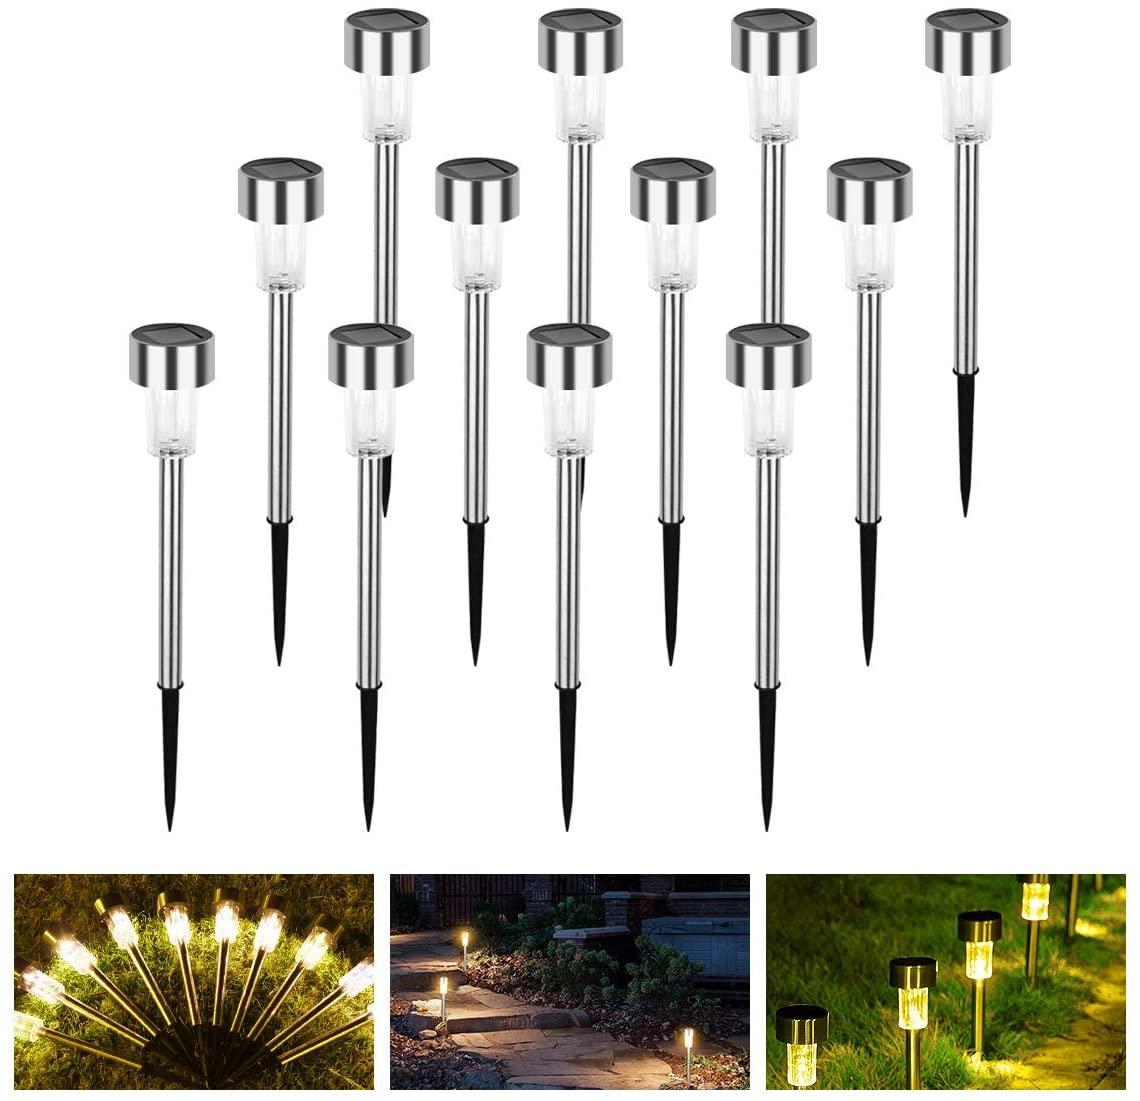 Solar Lights Outdoor 12 Pack, Lychee Stainless Steel Solar Pathway Light Waterproof LED Garden Light (Warm White)